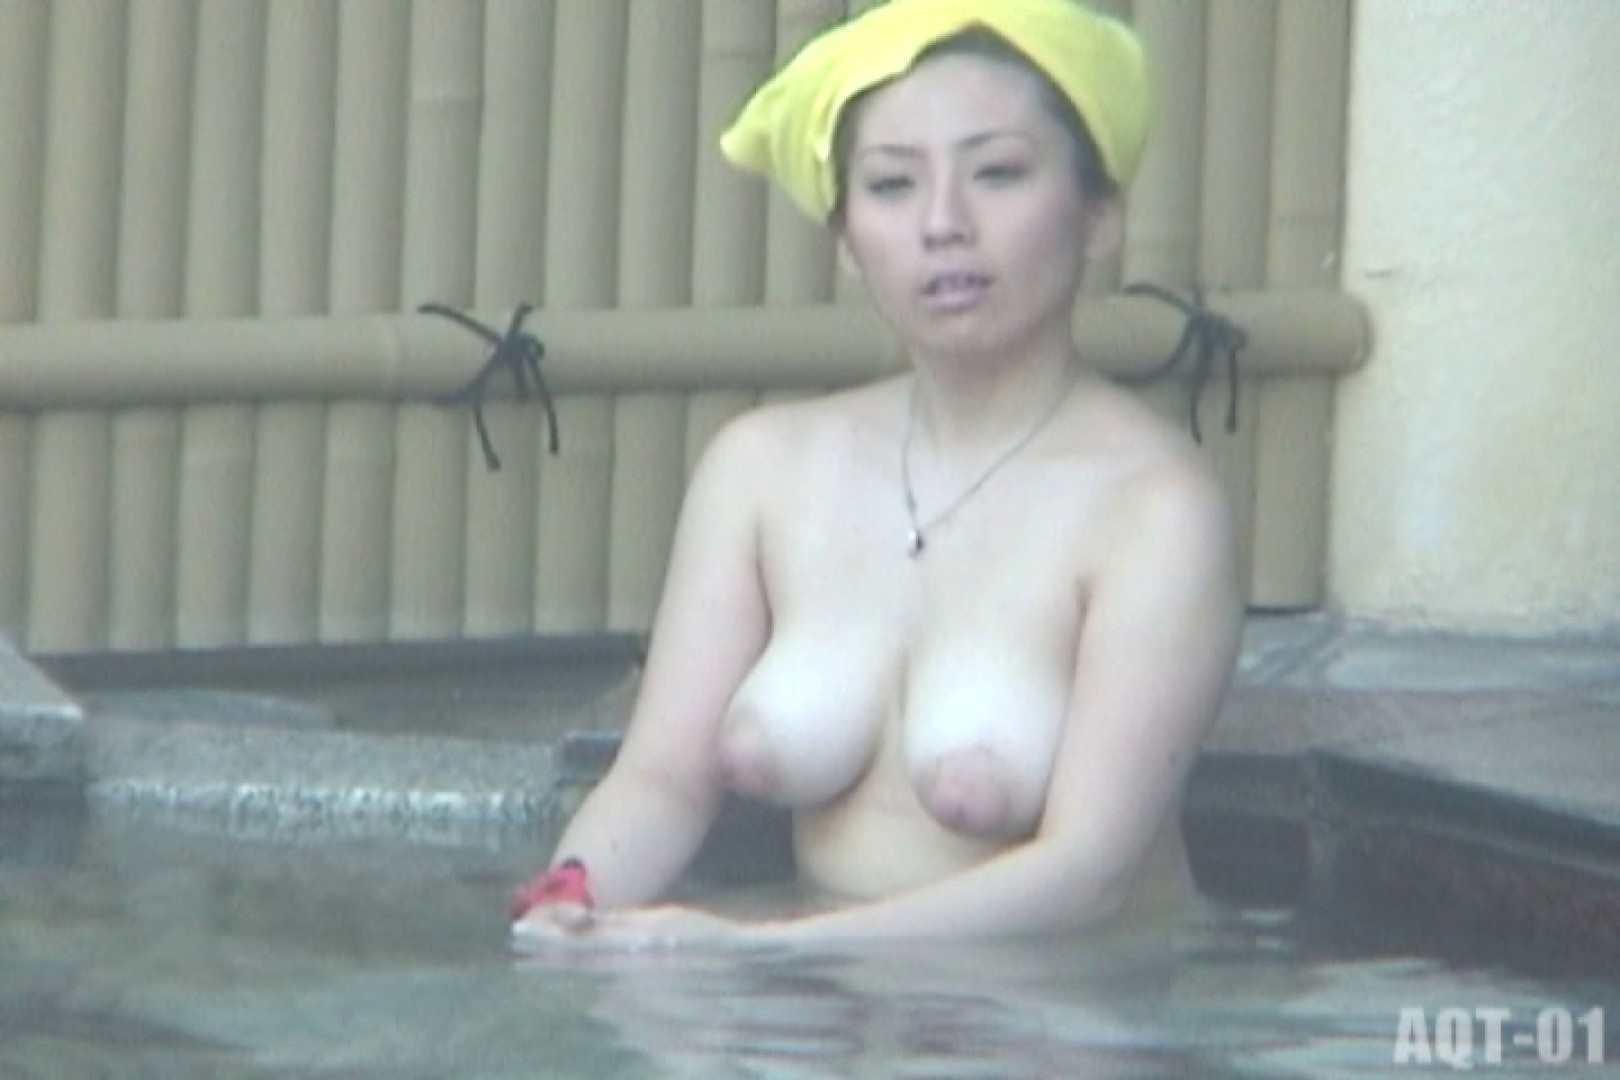 Aquaな露天風呂Vol.713 HなOL | 露天  52pic 25